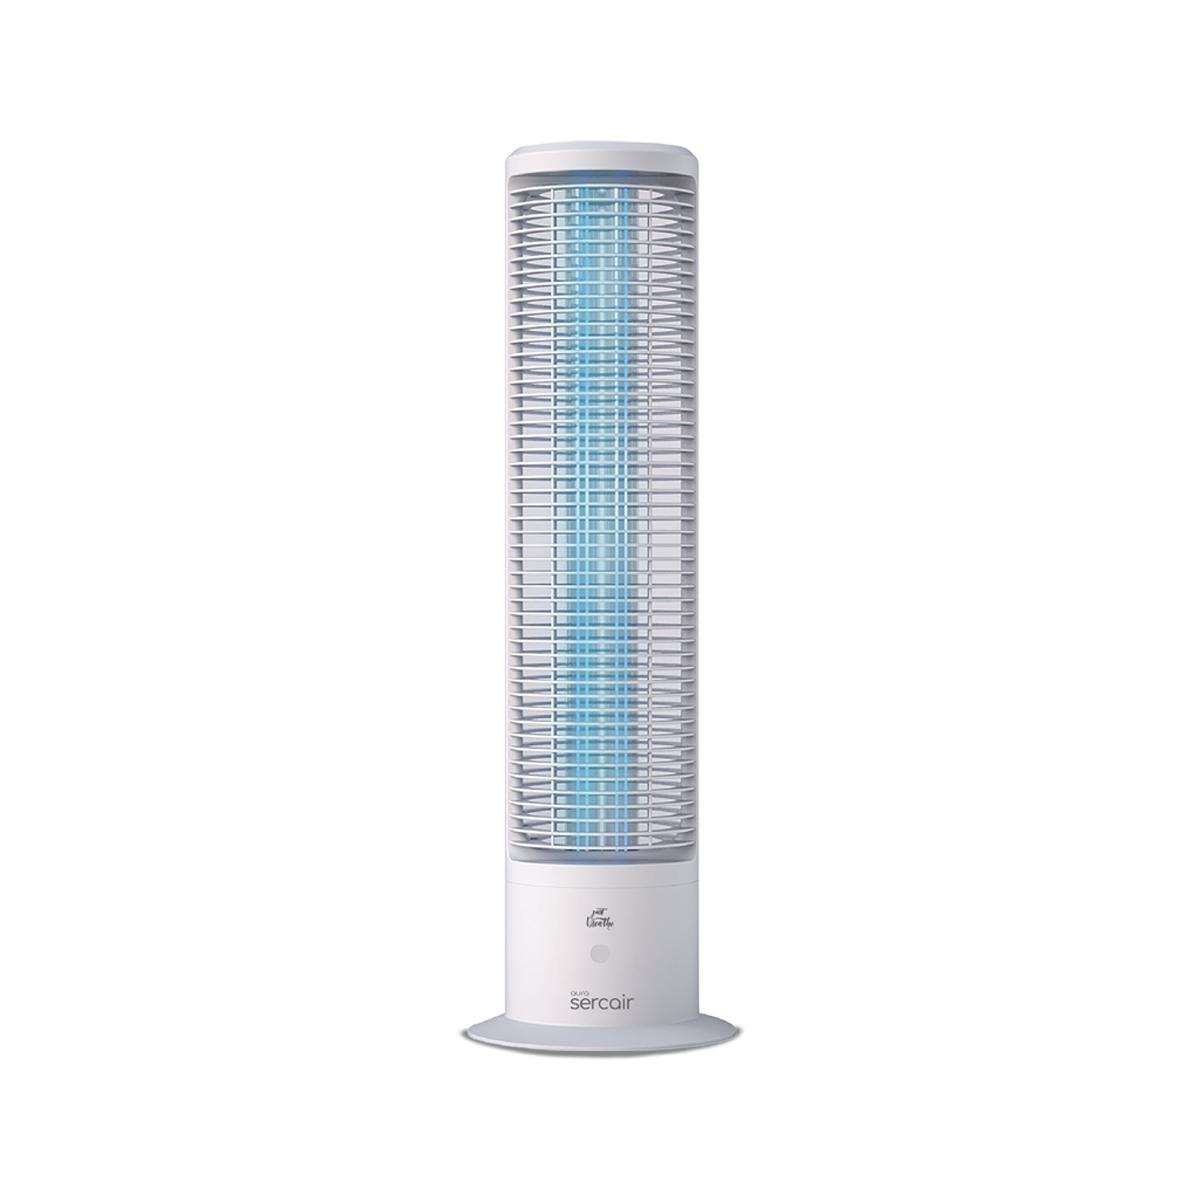 Lampa Uvc Sterilizare D Senzor Prezenta Aura Alb Sercair